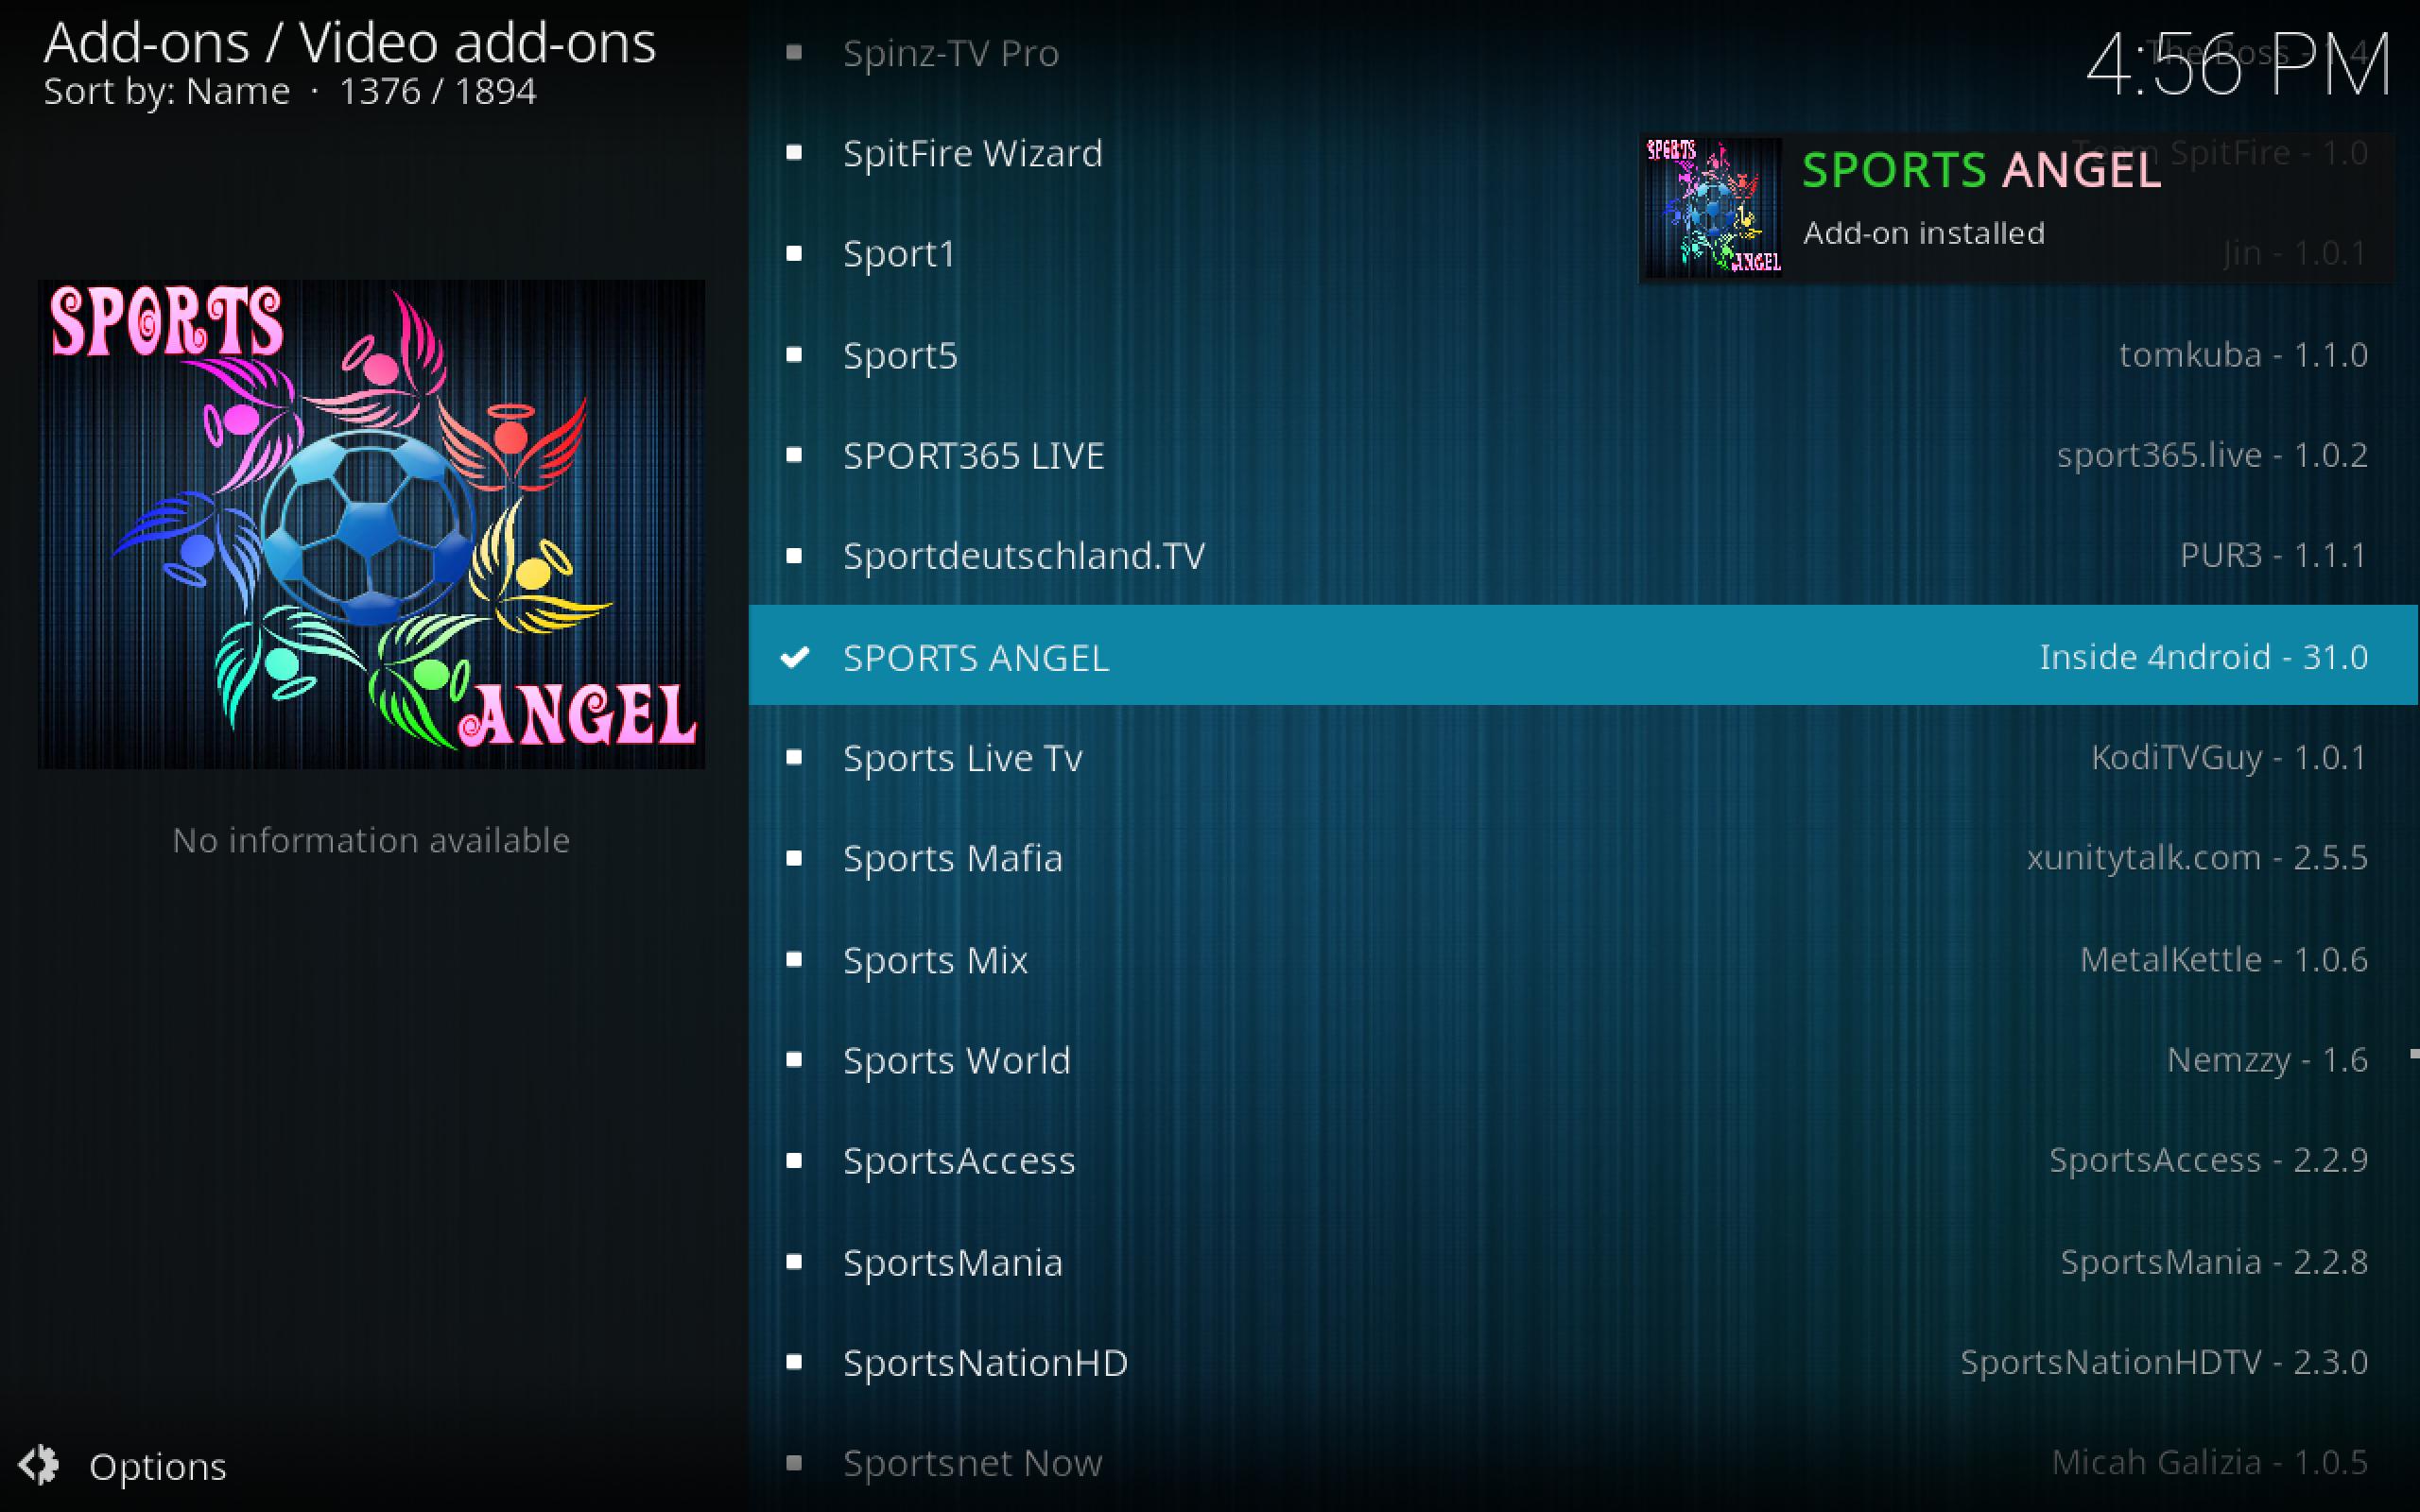 Sports Angel Installed via SR